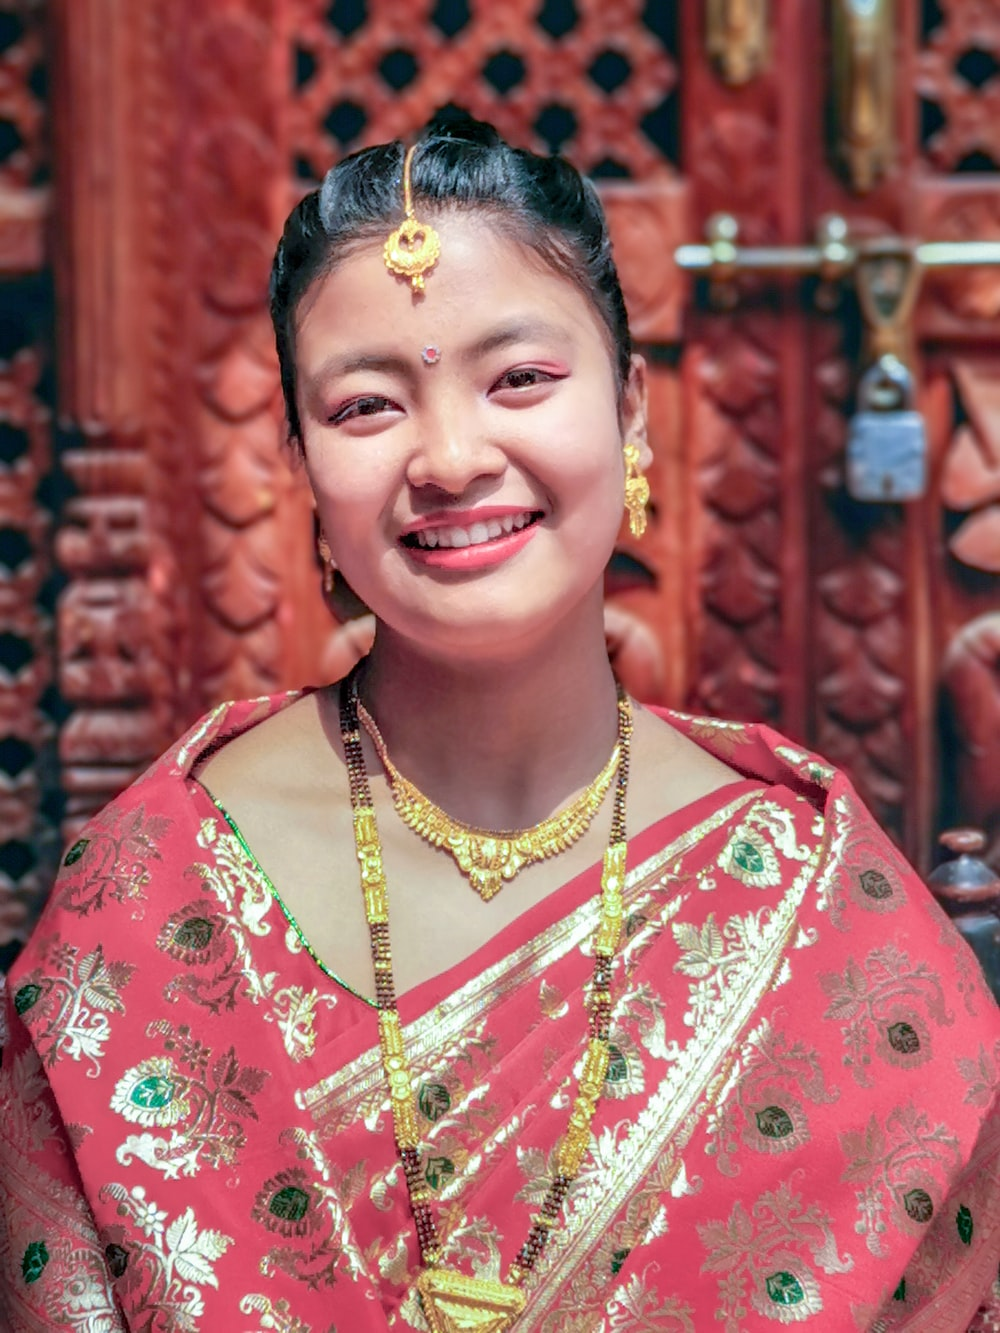 woman wears pink sari dress